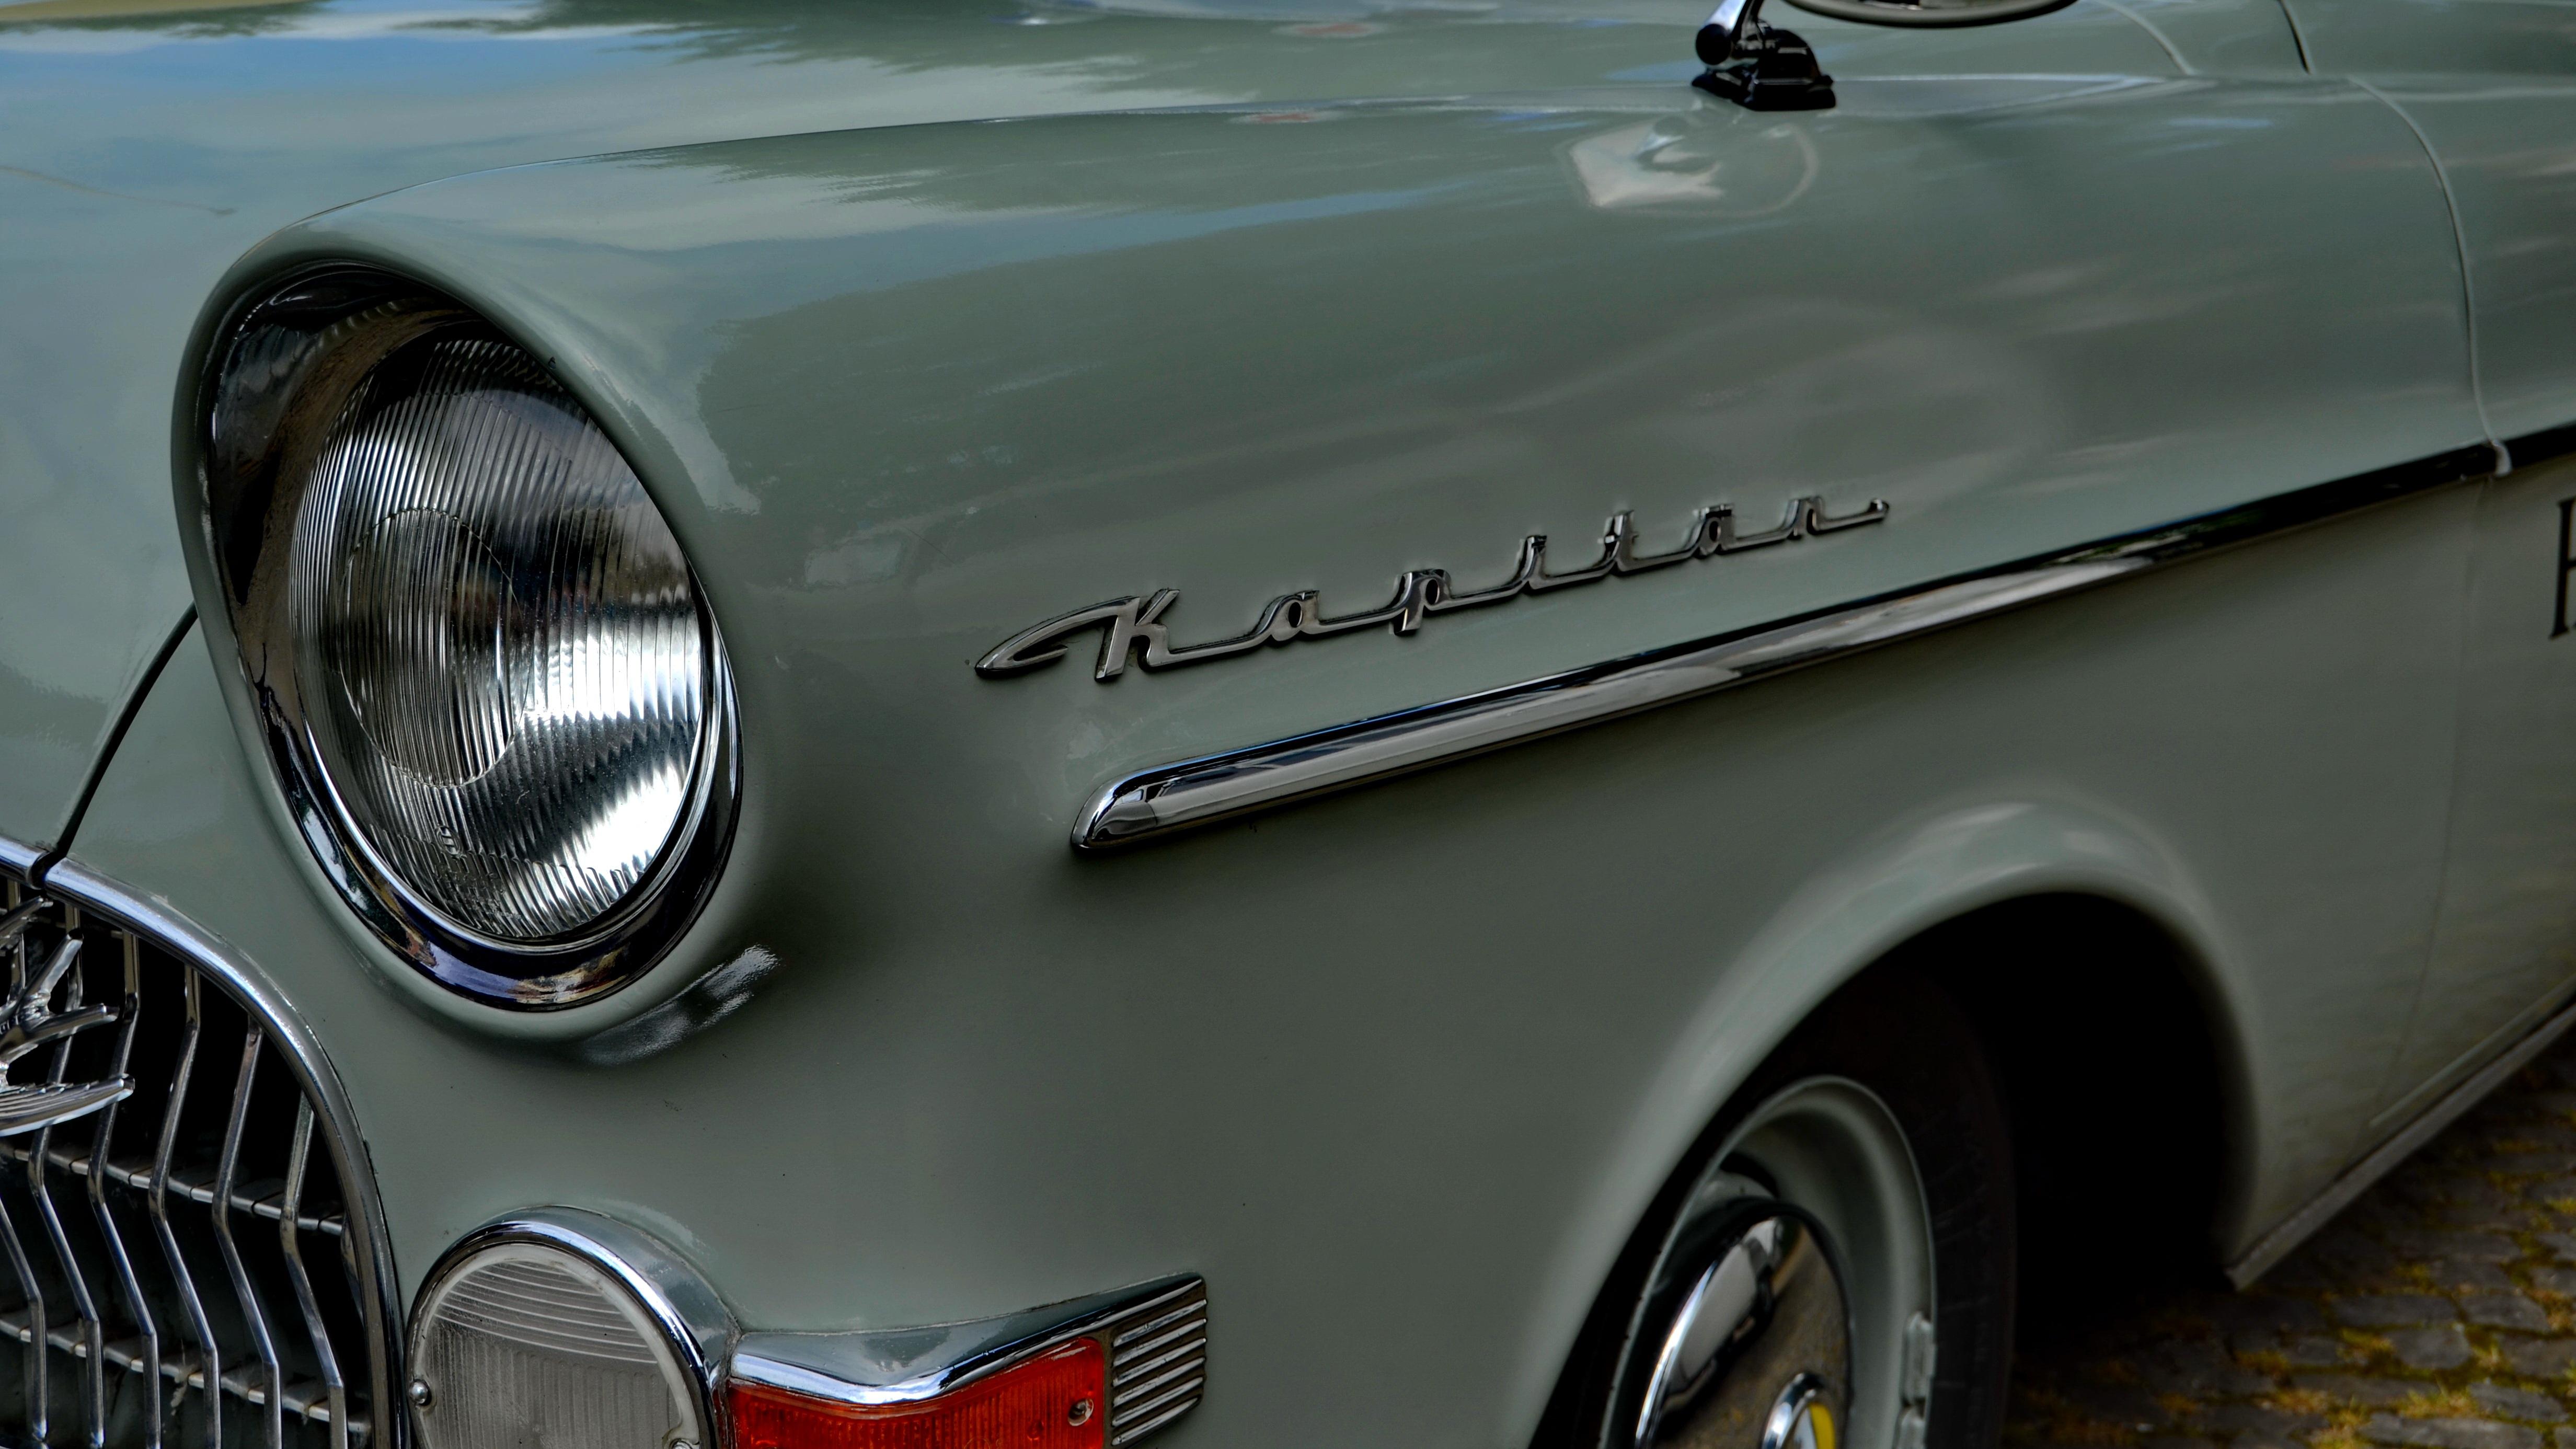 free images : wheel, old, auto, nostalgia, spotlight, motor vehicle